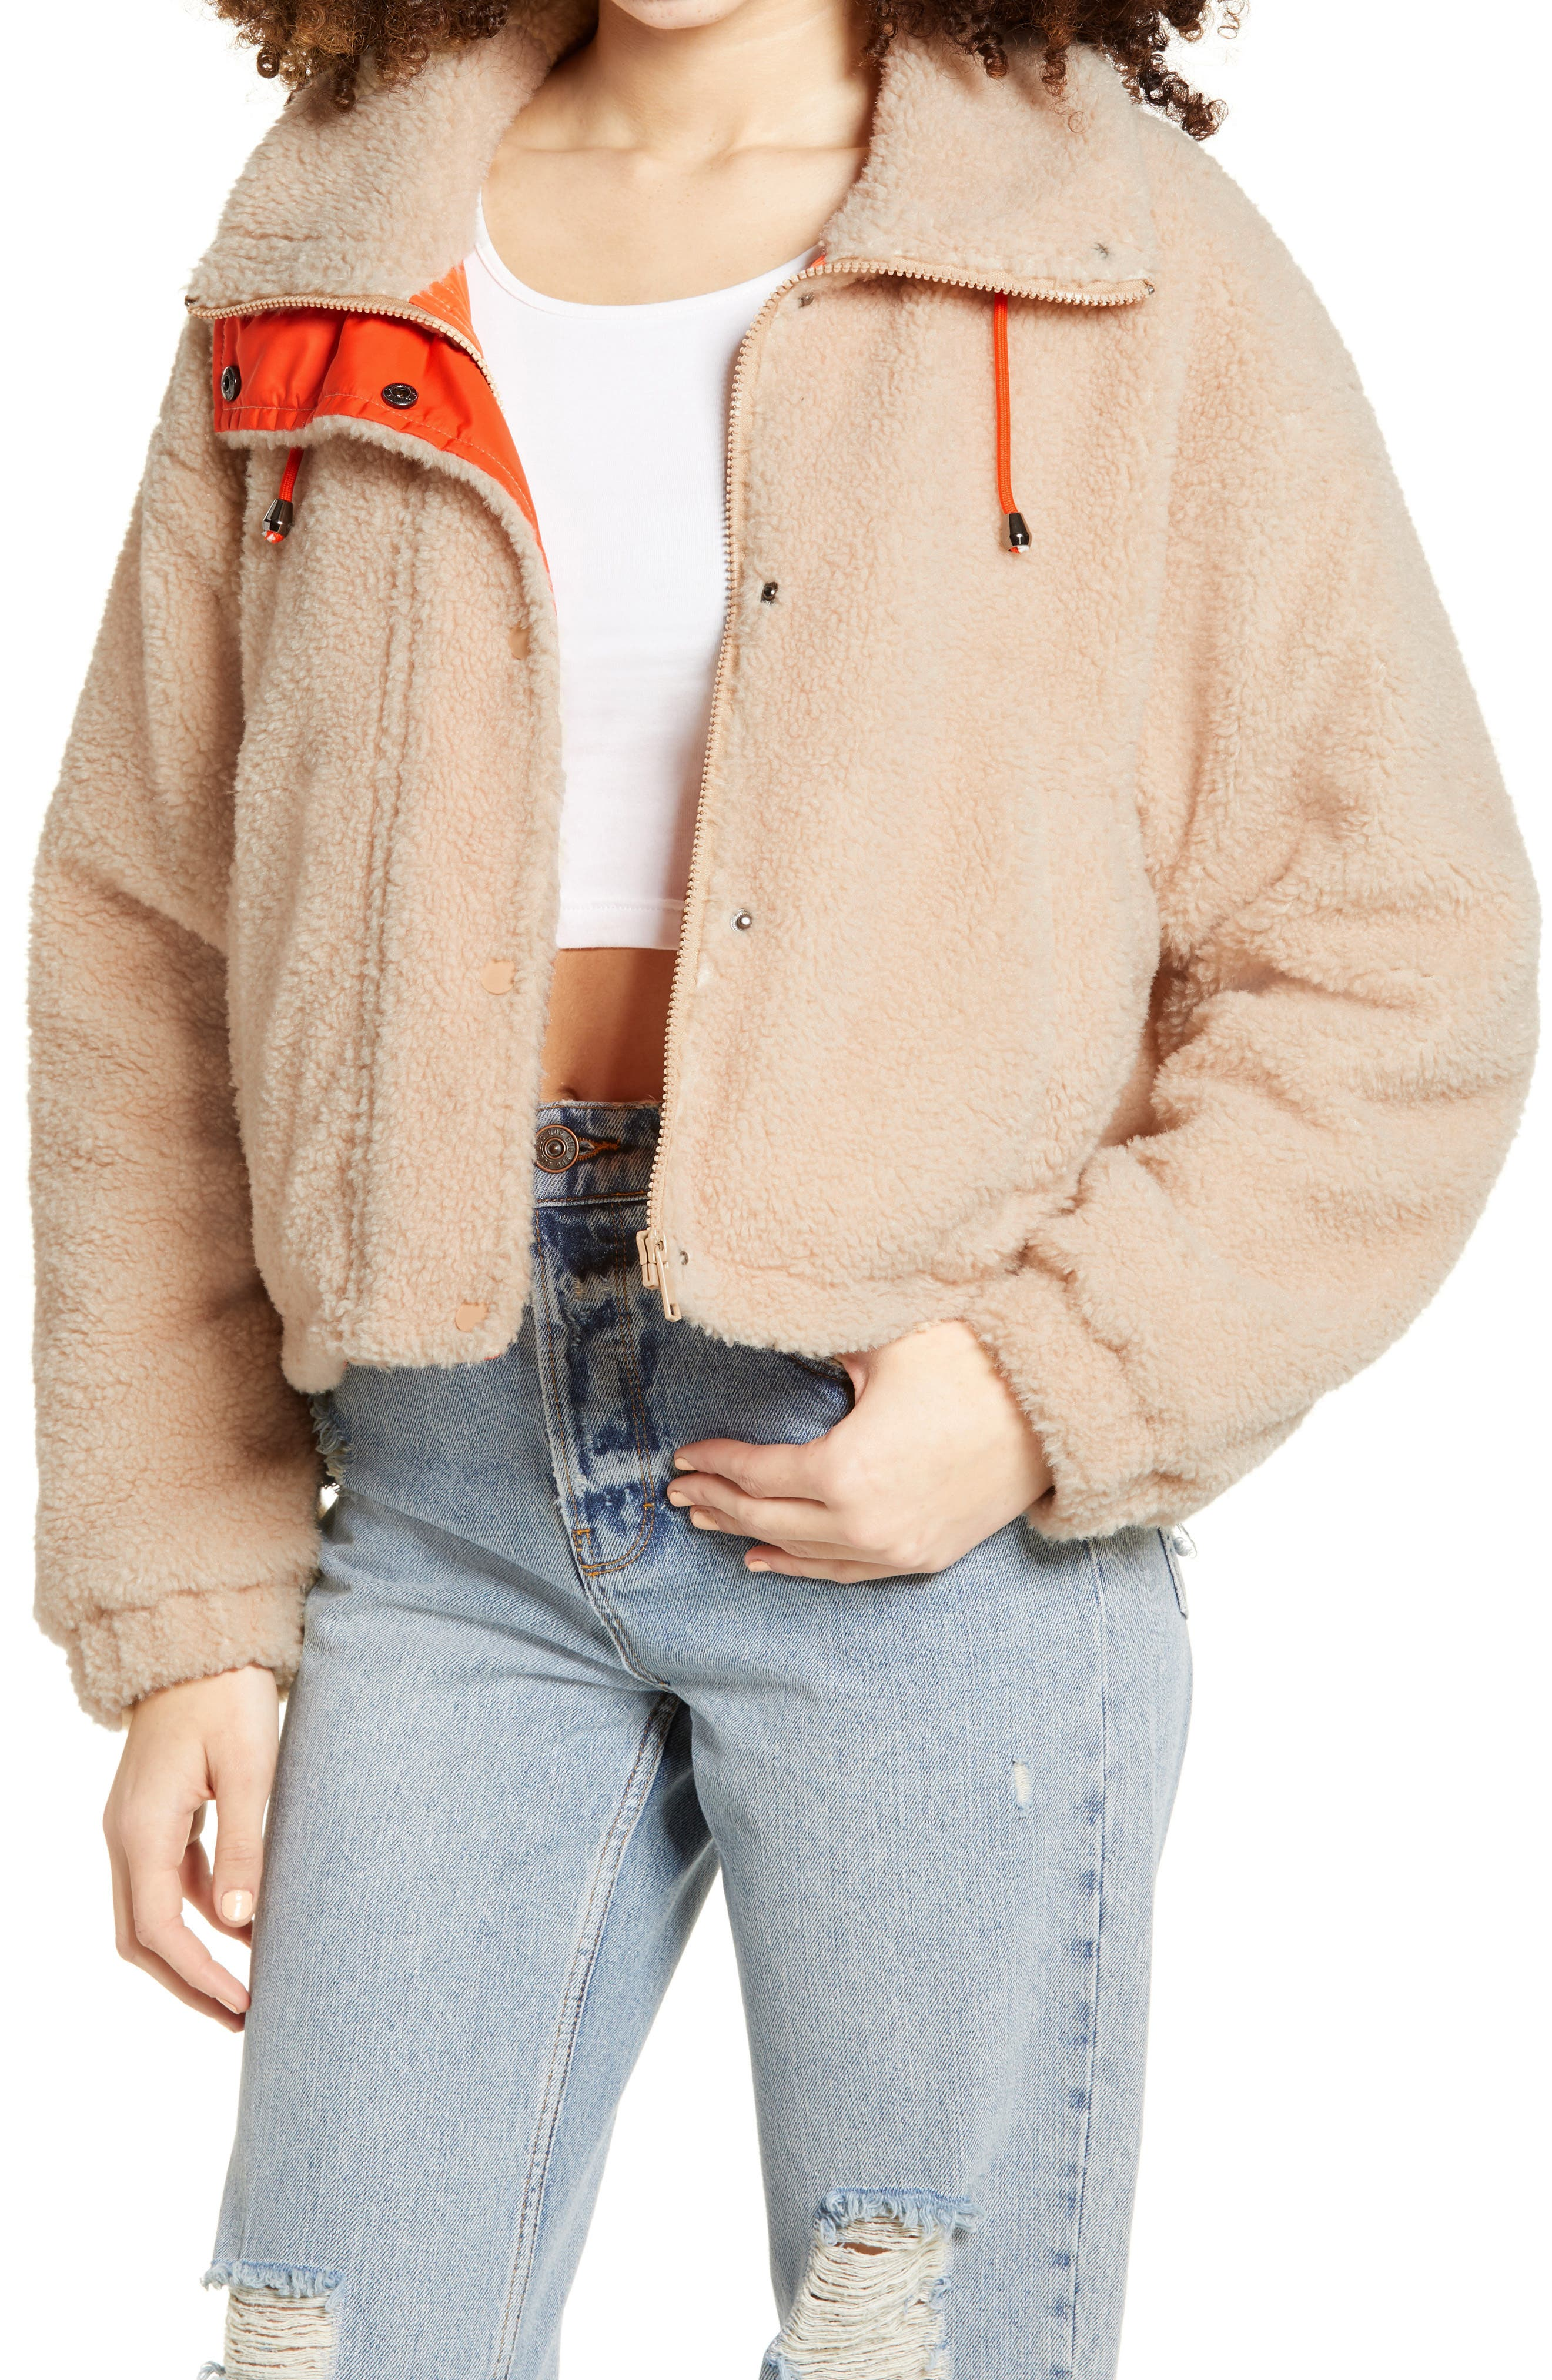 Ladies Womens Jacket Hooded Winter Top Parker Parka Short Coat Outwear Big Size